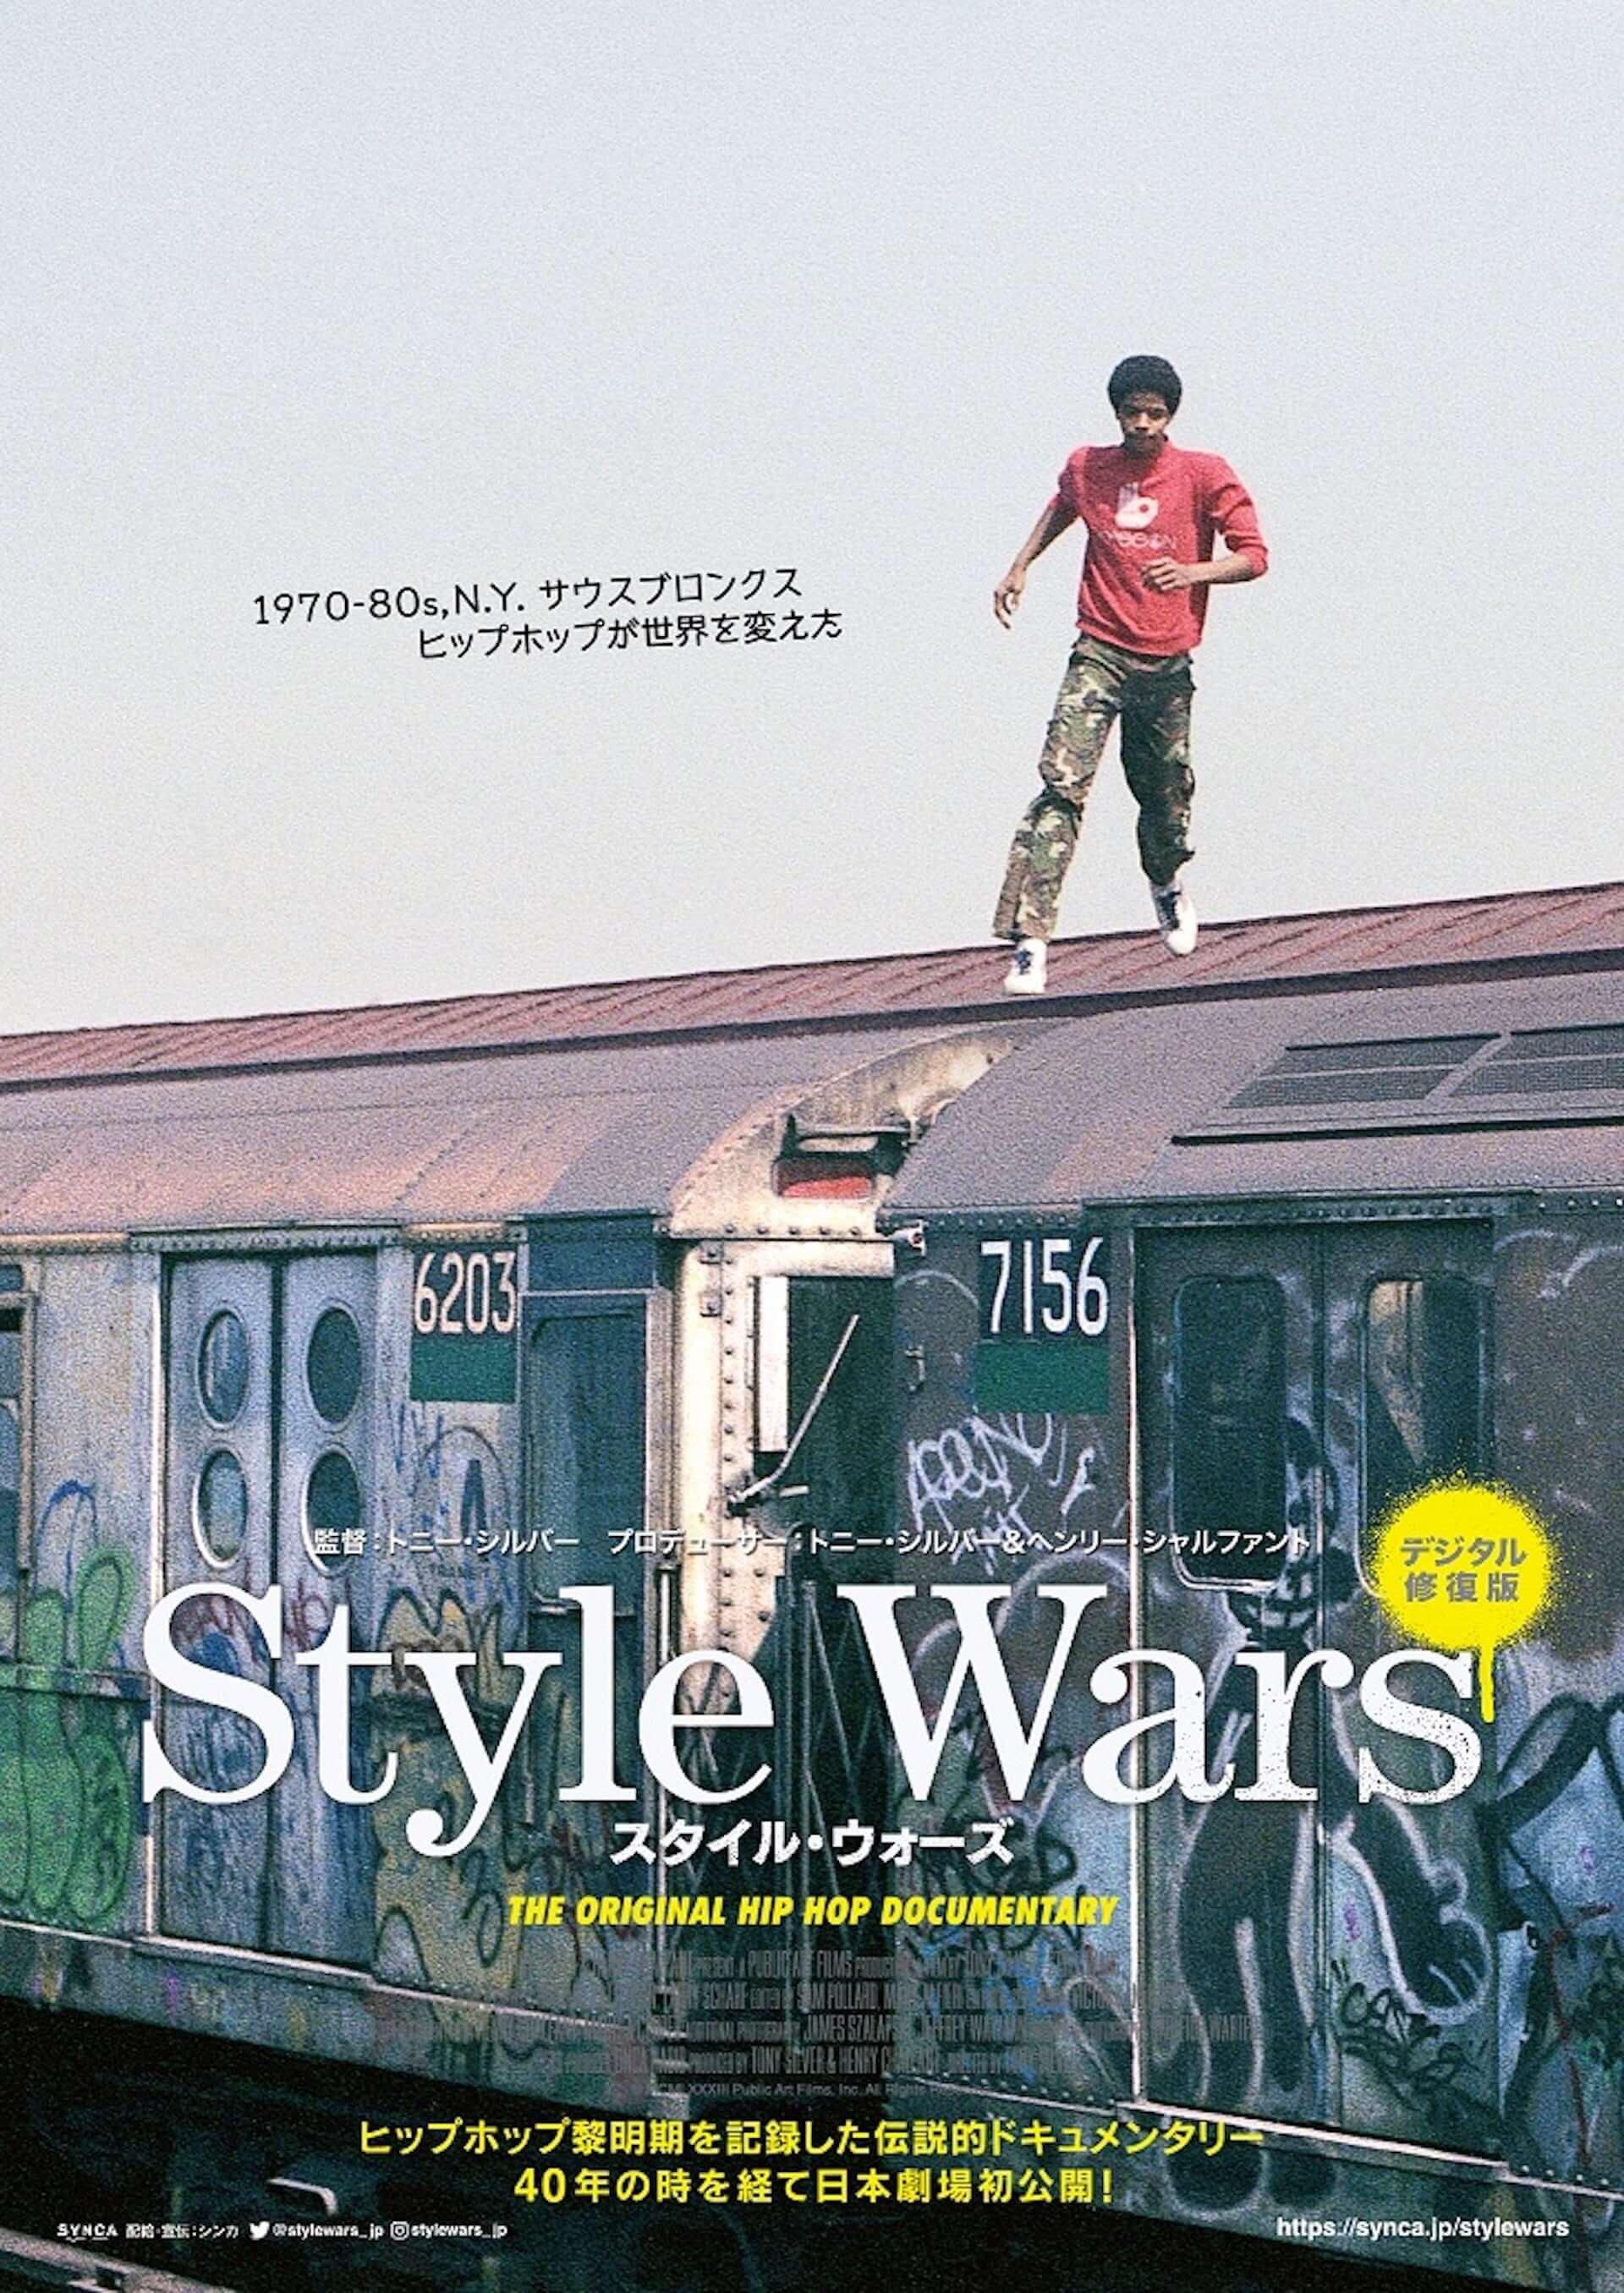 『Style Wars』先行上映会にANIとサイプレス上野が参加決定!宇多丸、tofubeats、Ghetto Hollywoodらのコメントも到着 film210317_stylewars_1-1920x2711